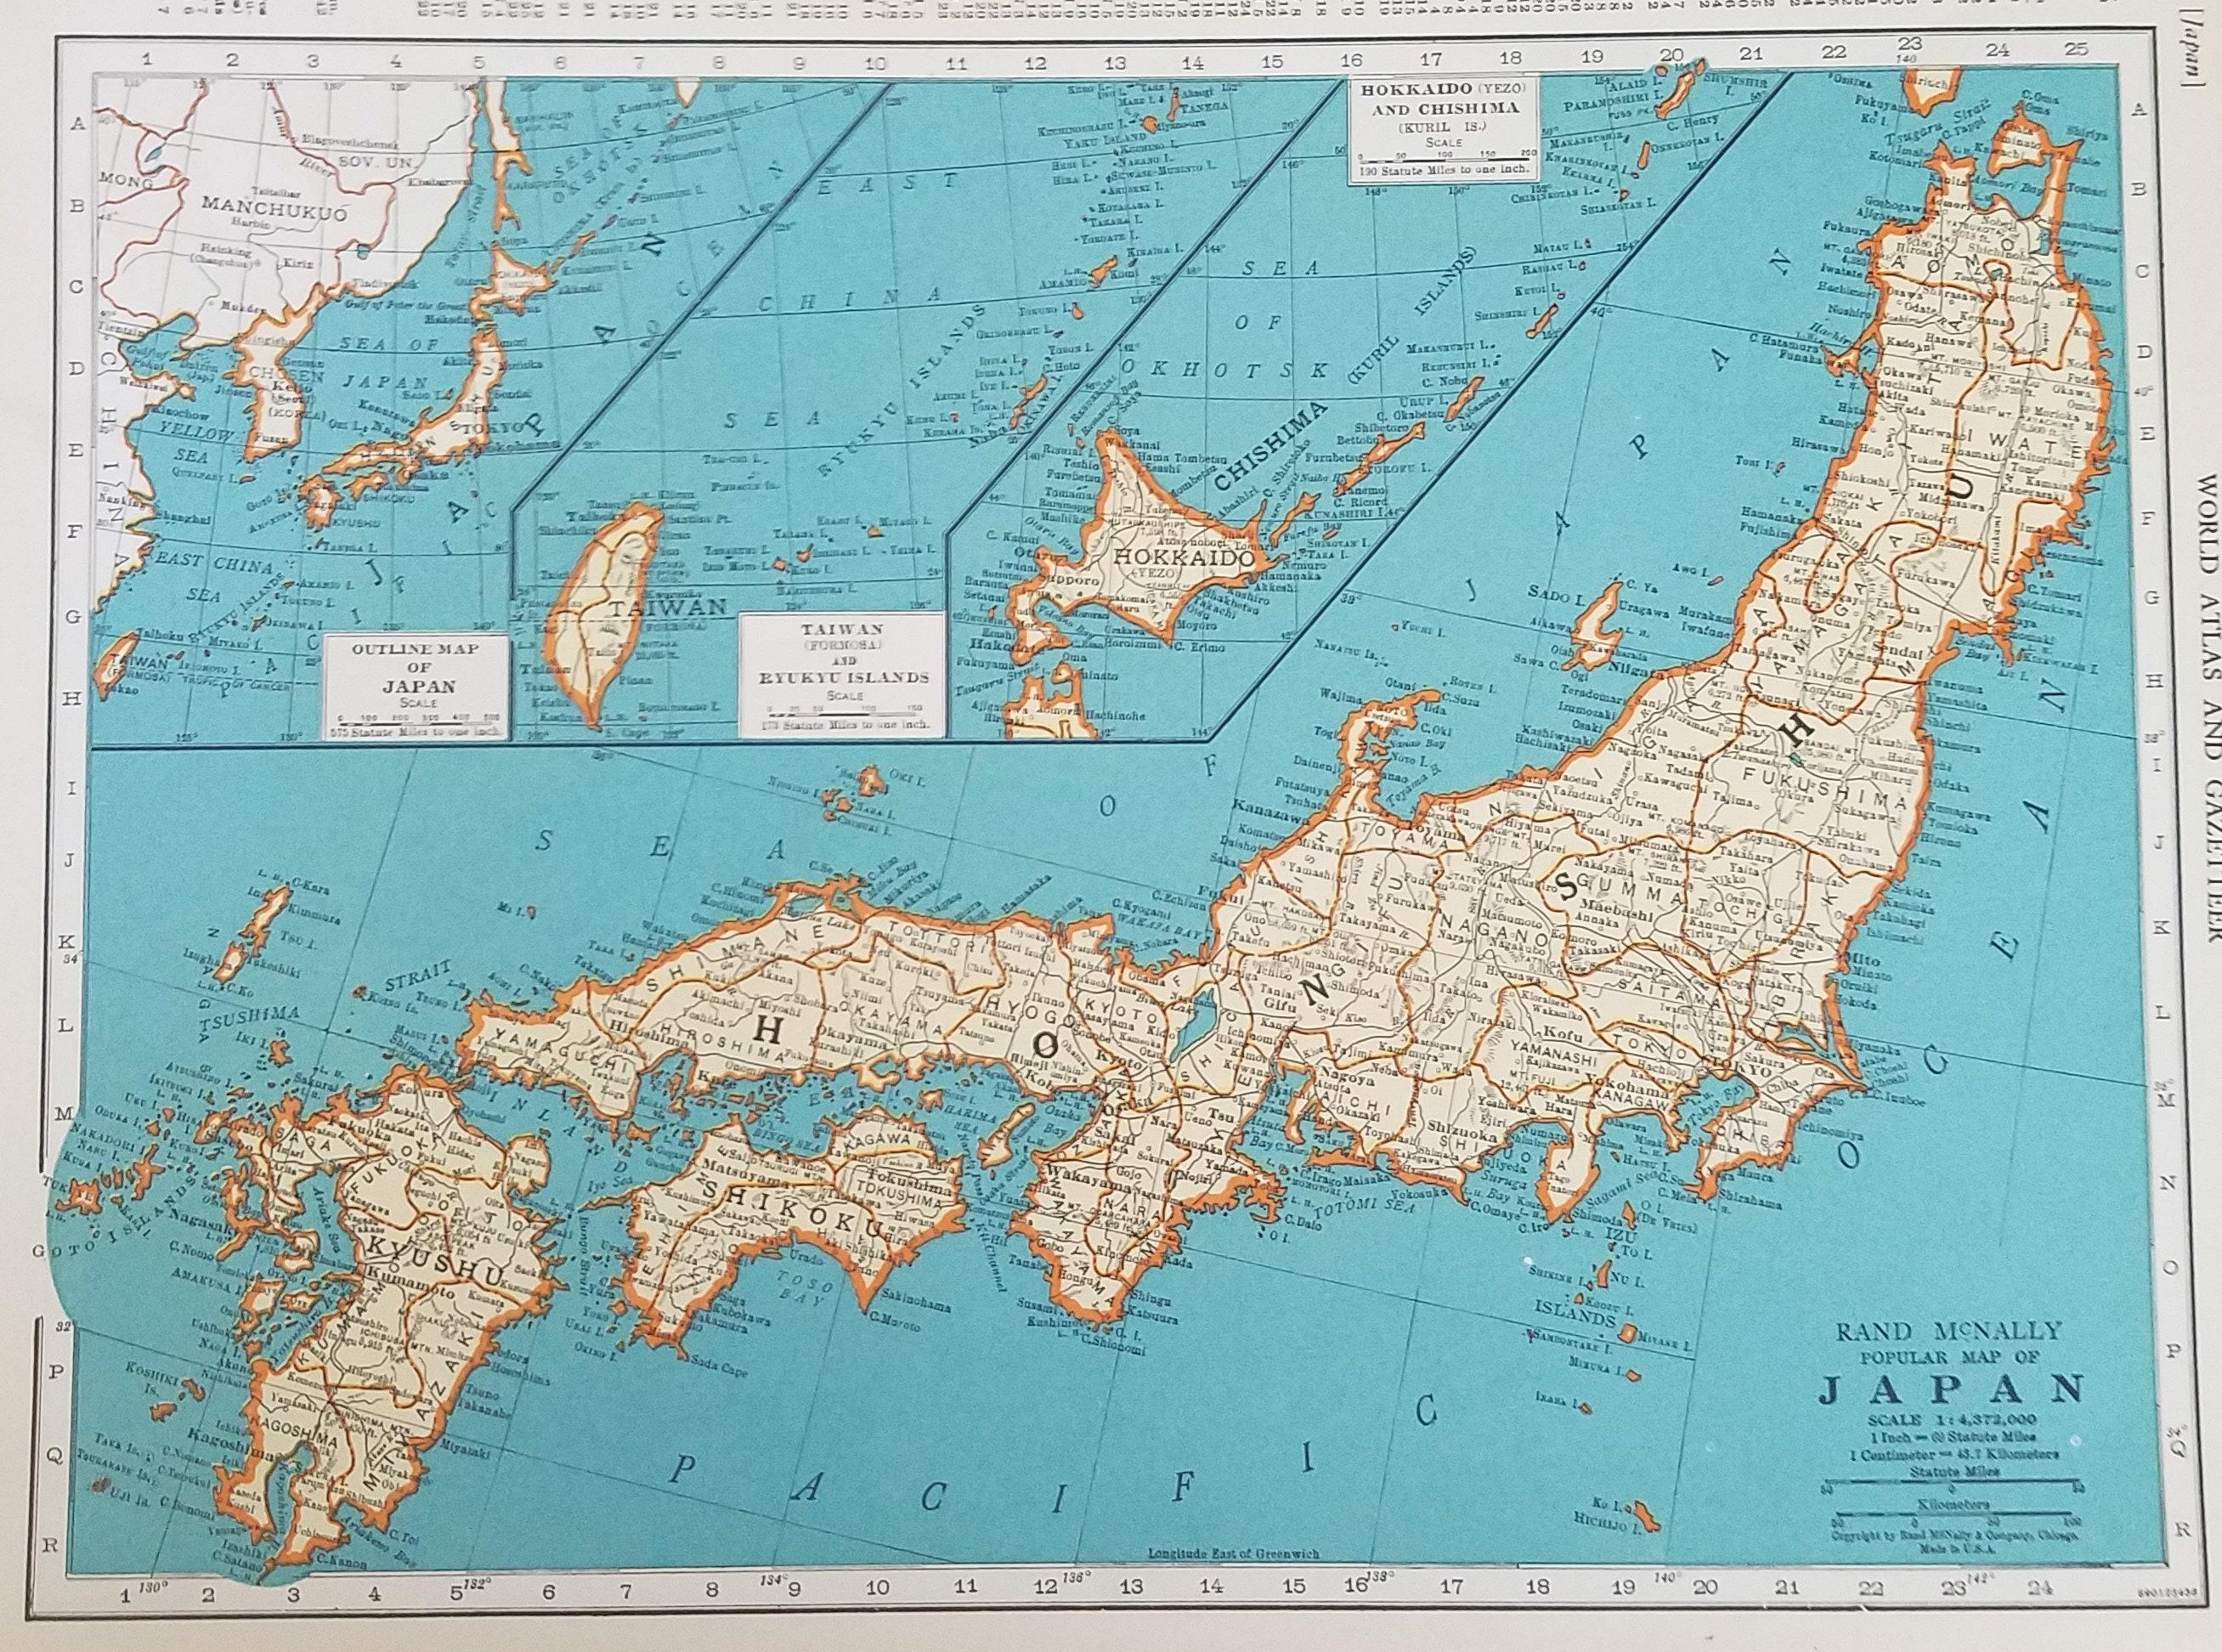 Hokkaido World Map.Japan Mapchina Mapsiam Korea Taiwan Hokkaido Indochina Etsy